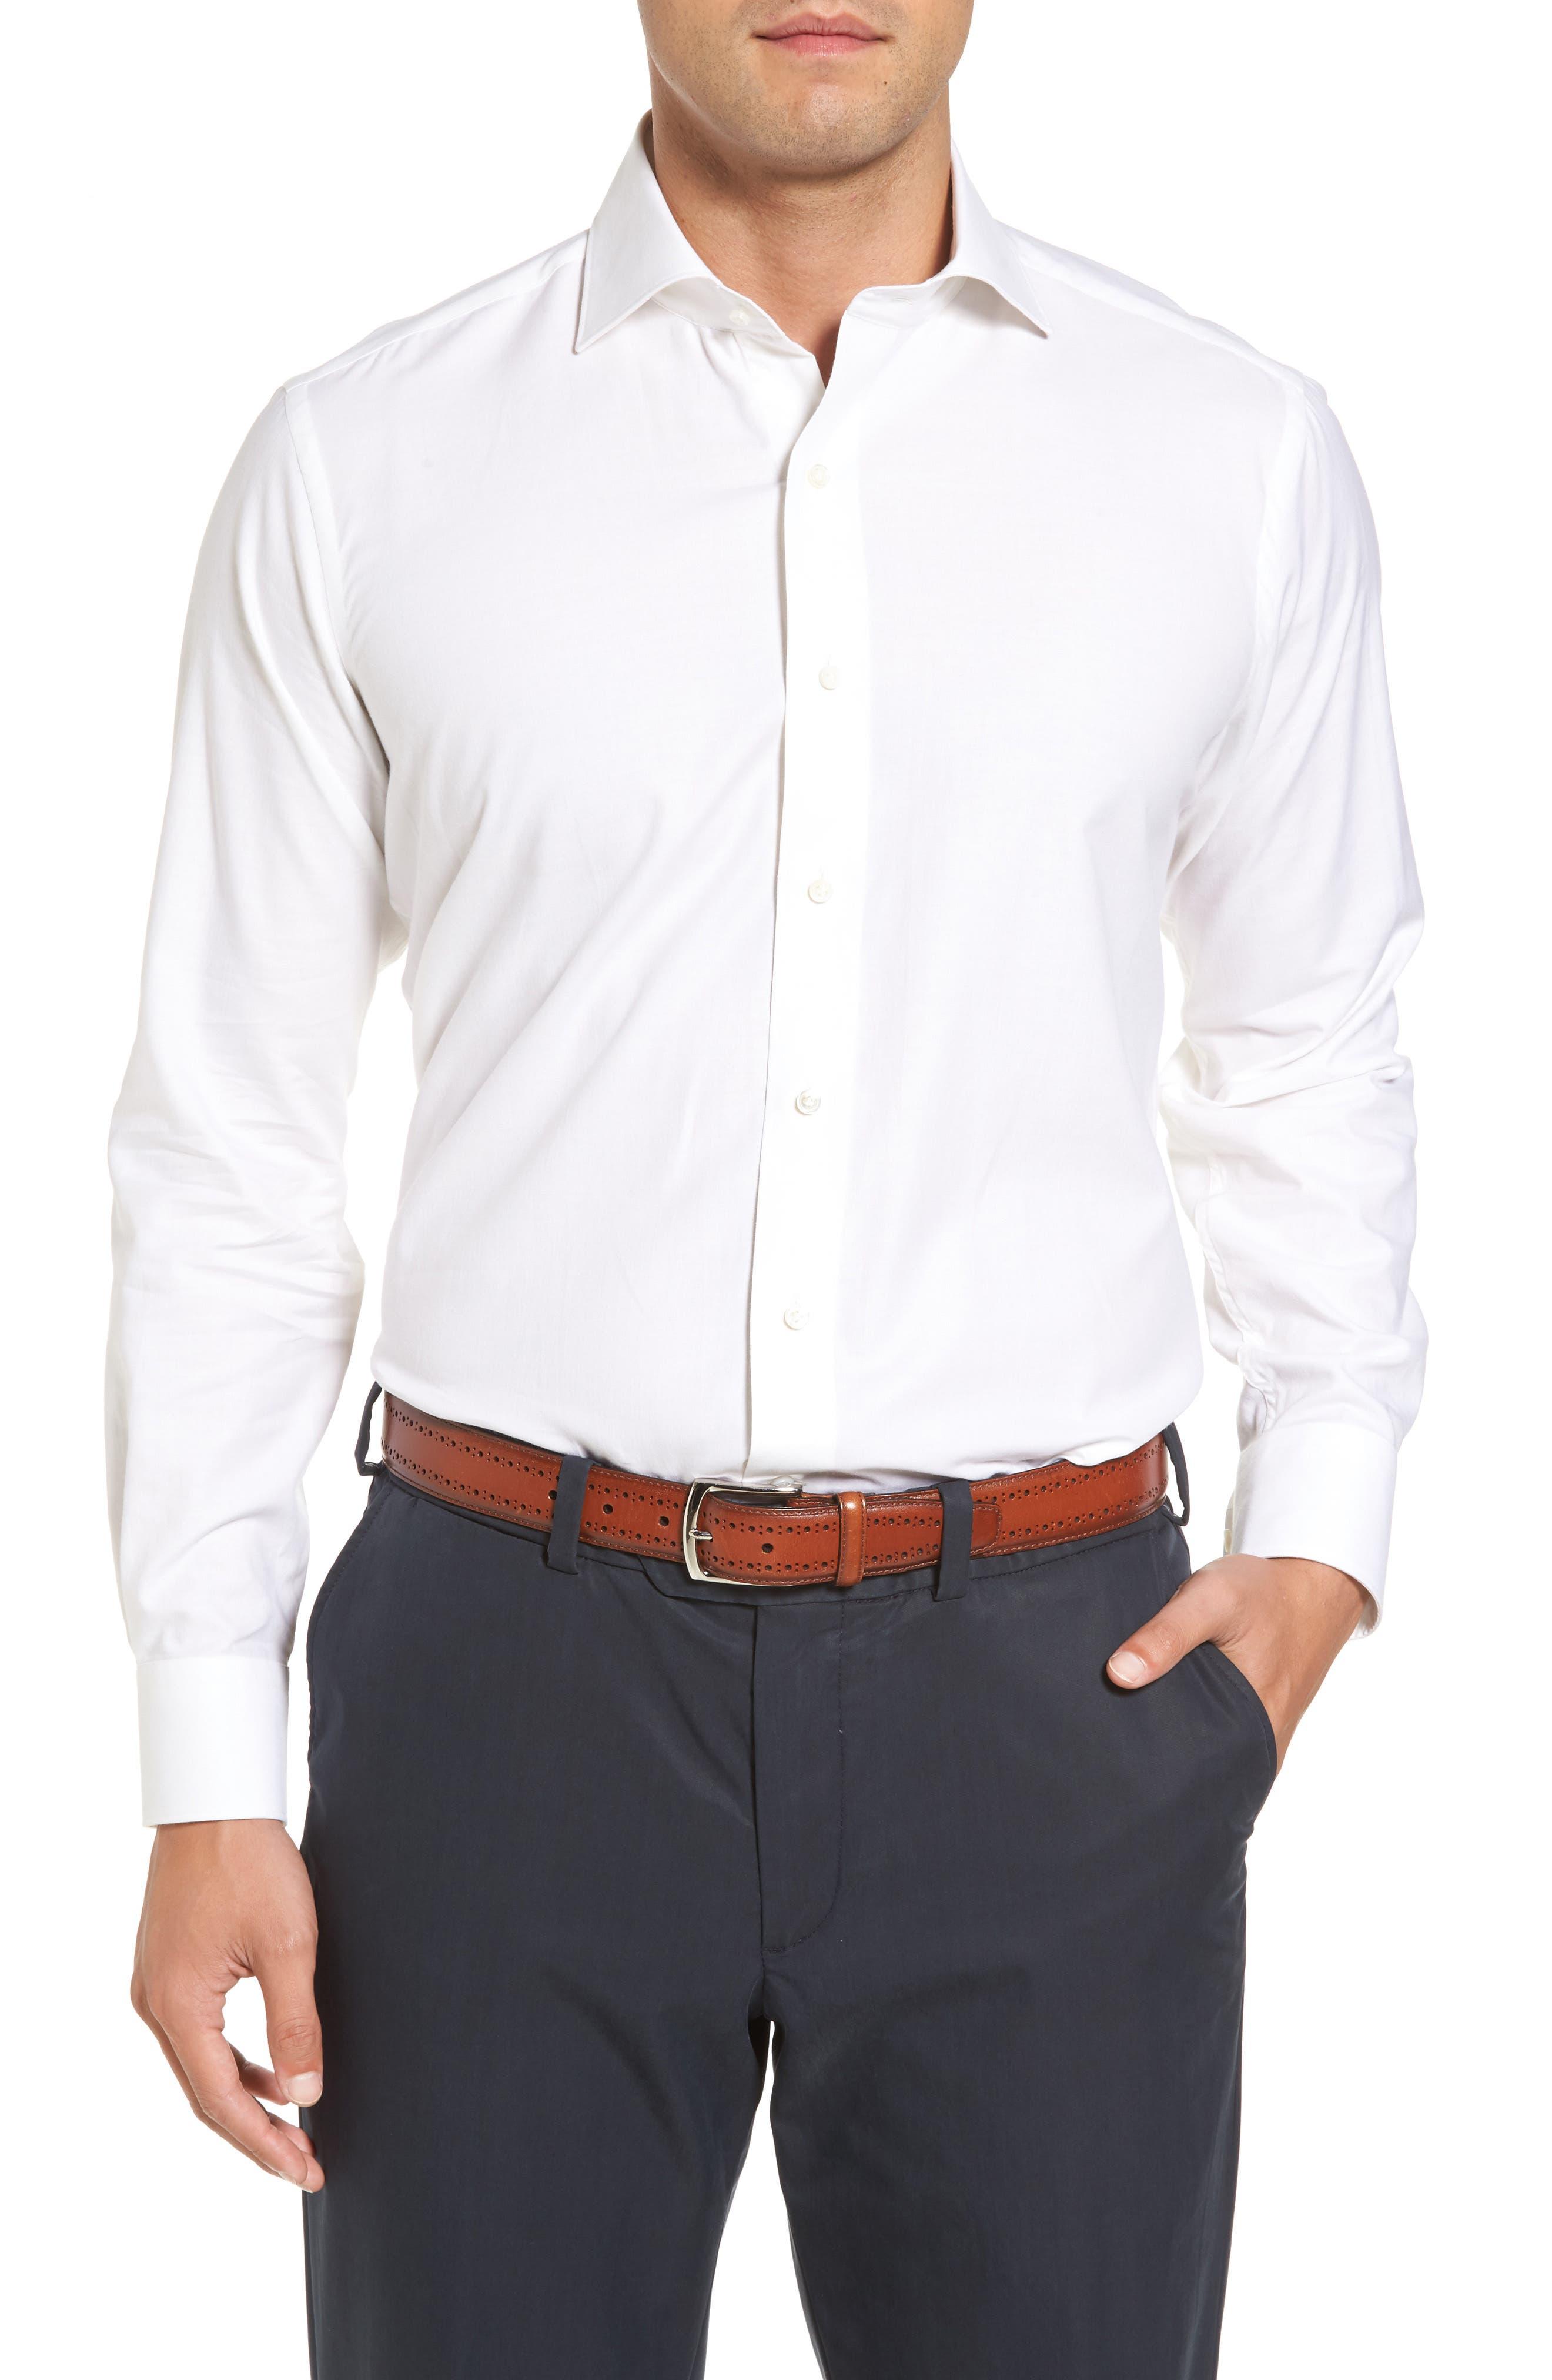 Silky Touch Herringbone Sport Shirt,                             Main thumbnail 1, color,                             100